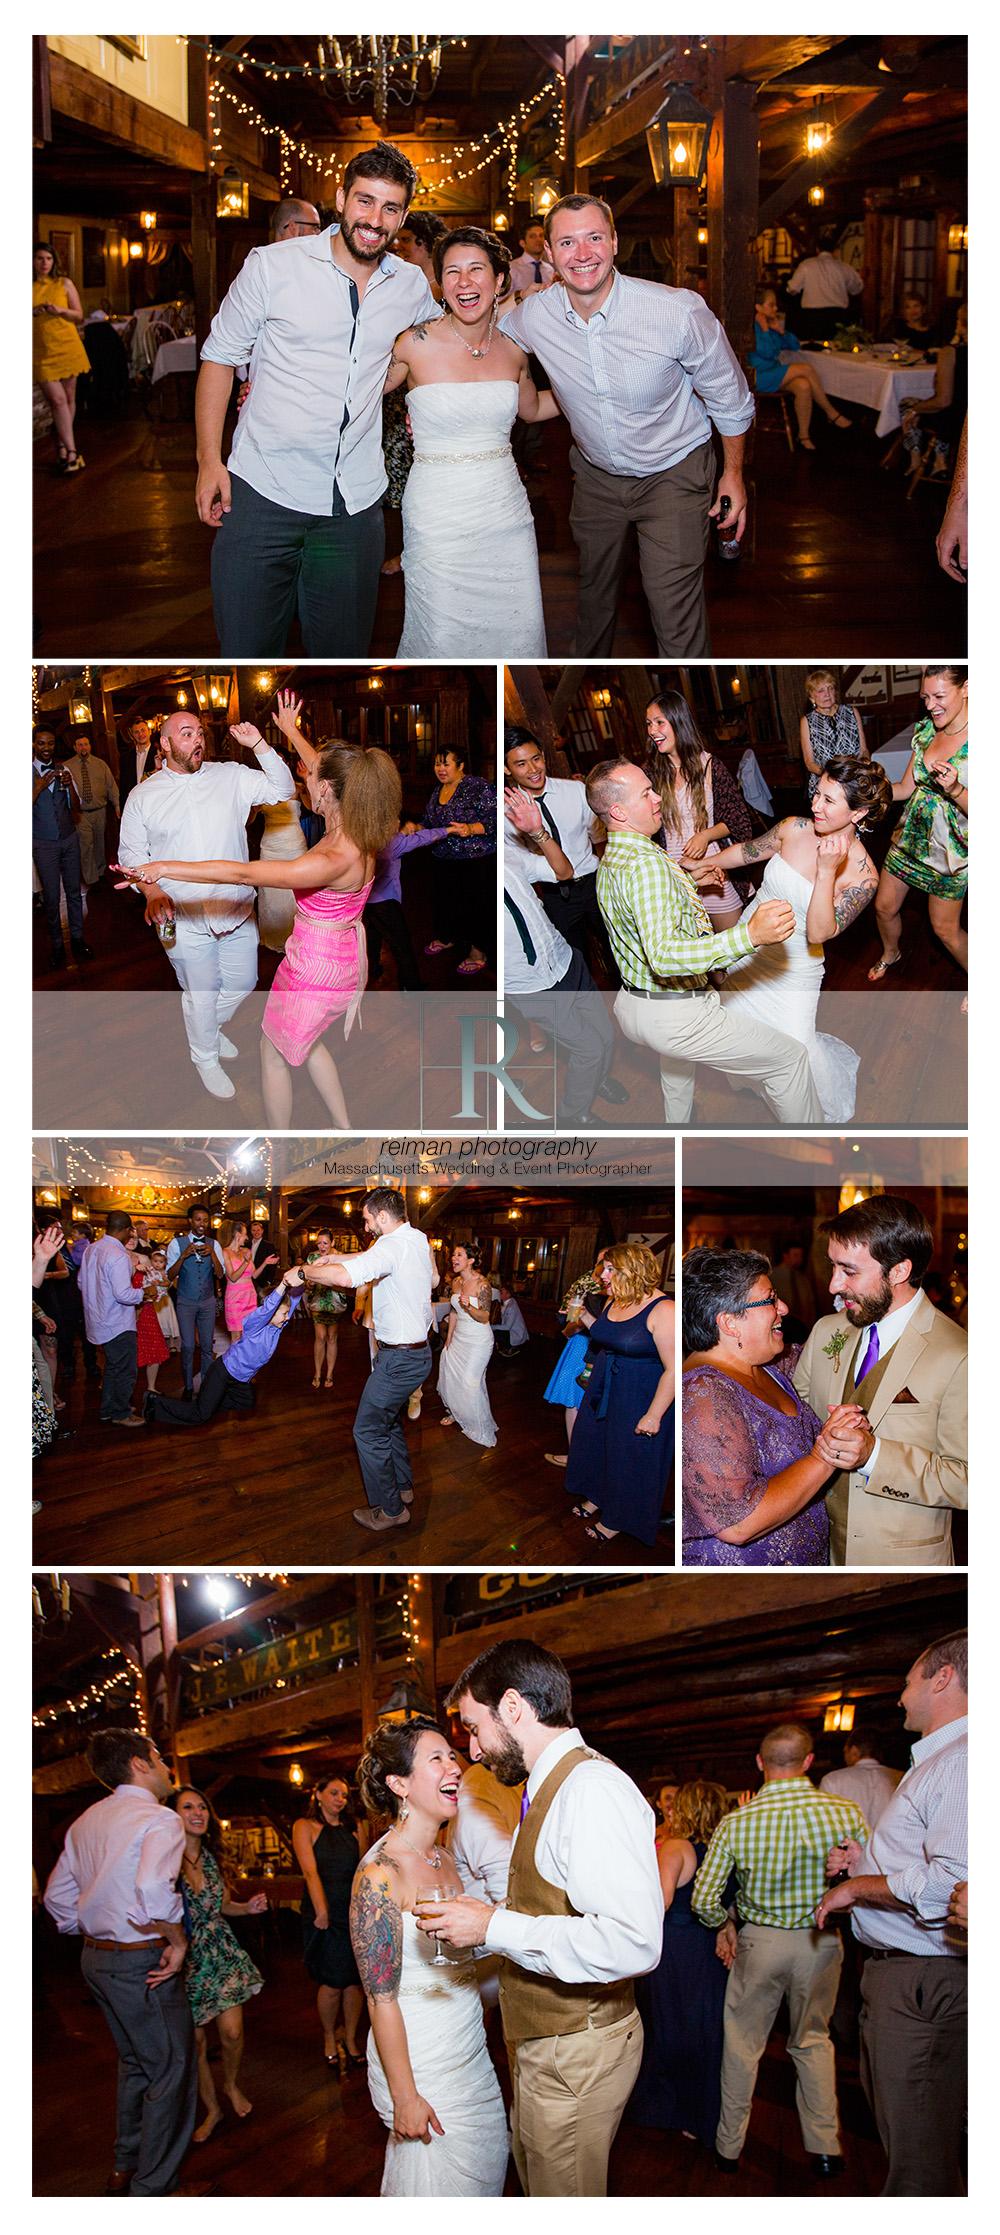 Reiman Photography, wedding, Salem Cross Inn, Rustic Summer Wedding